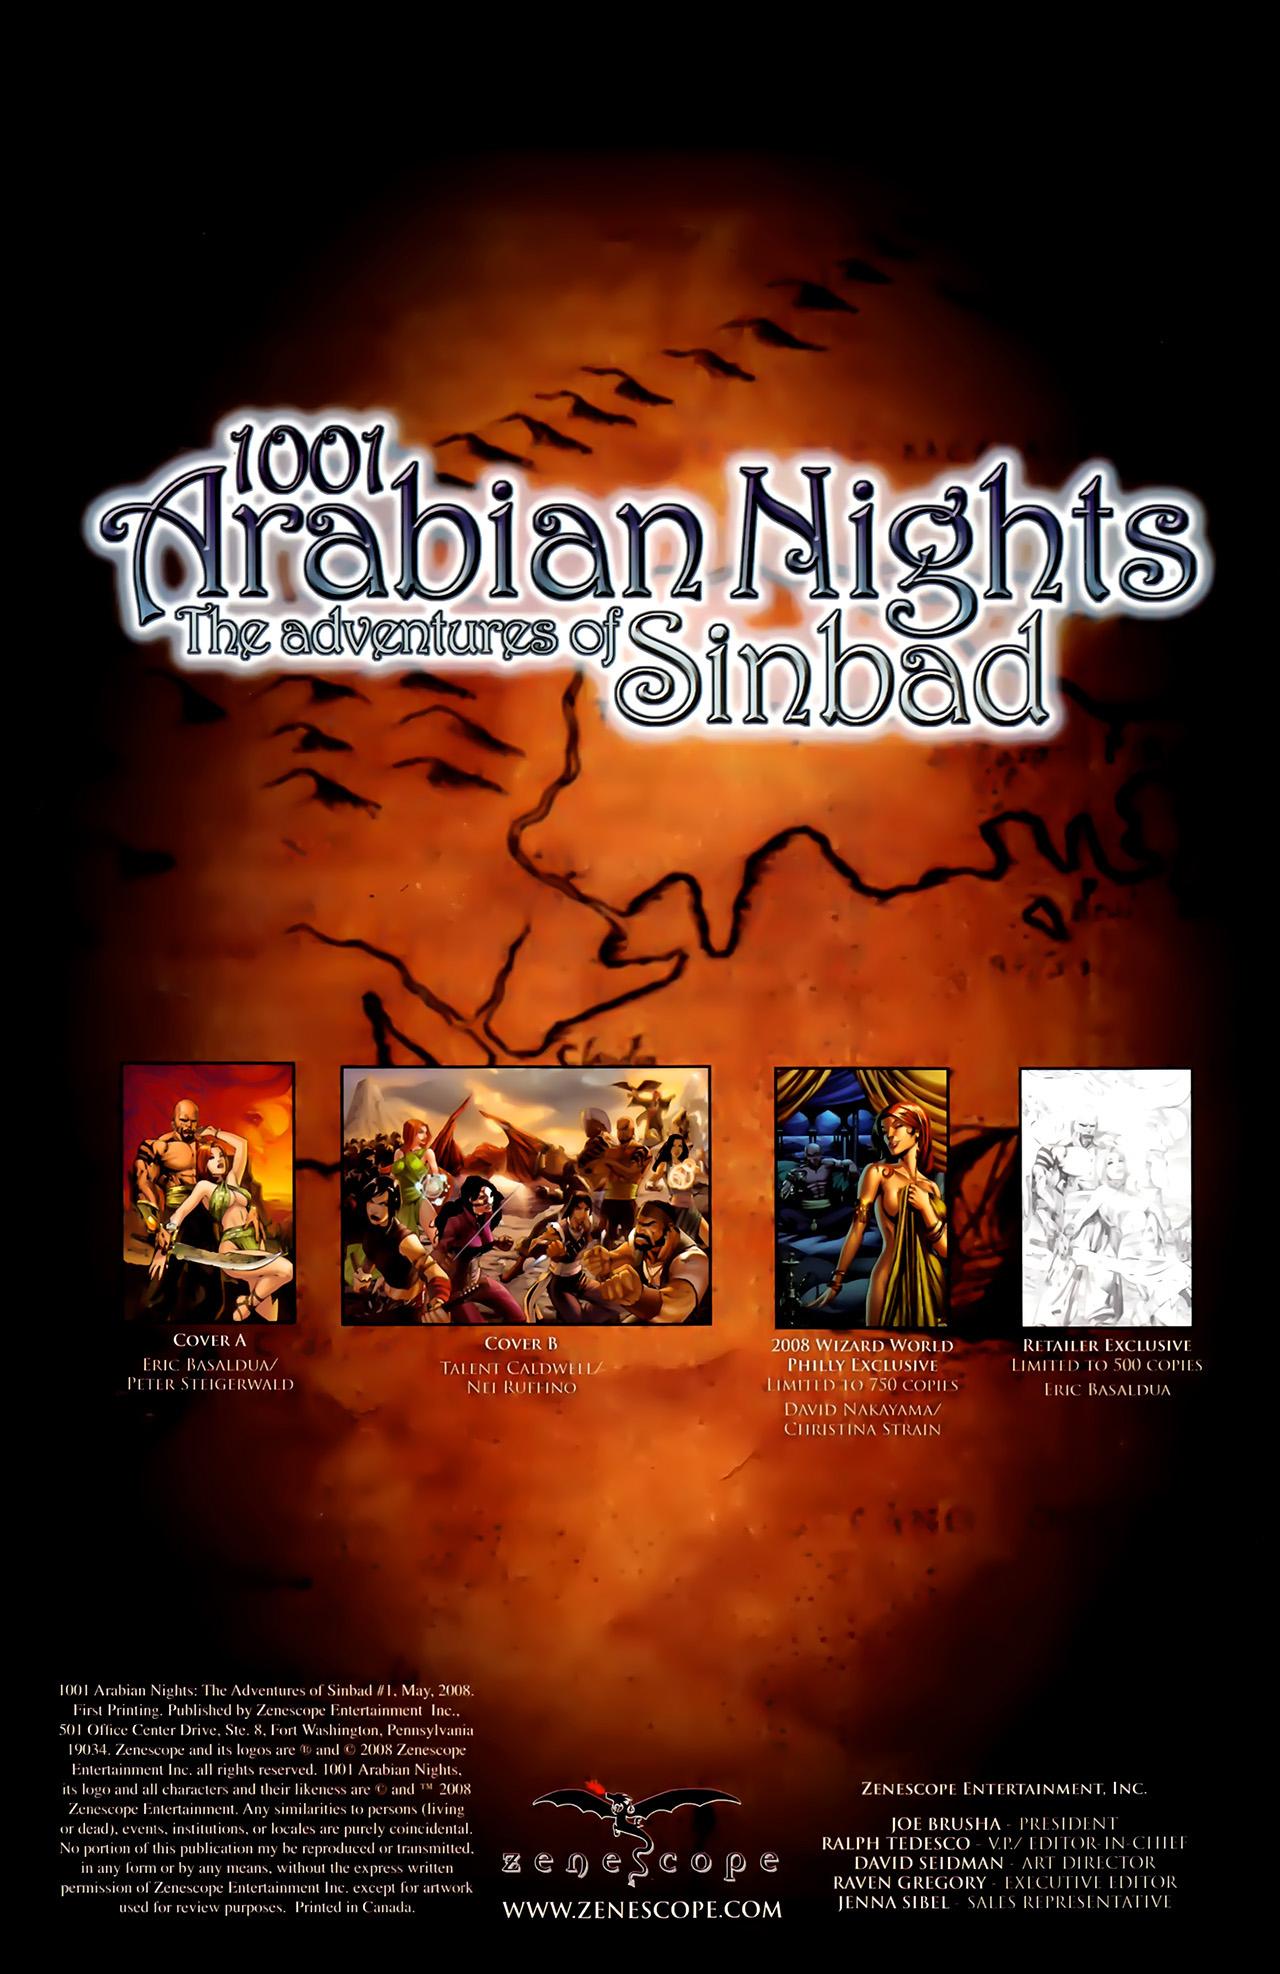 Read online 1001 Arabian Nights: The Adventures of Sinbad comic -  Issue #1 - 5